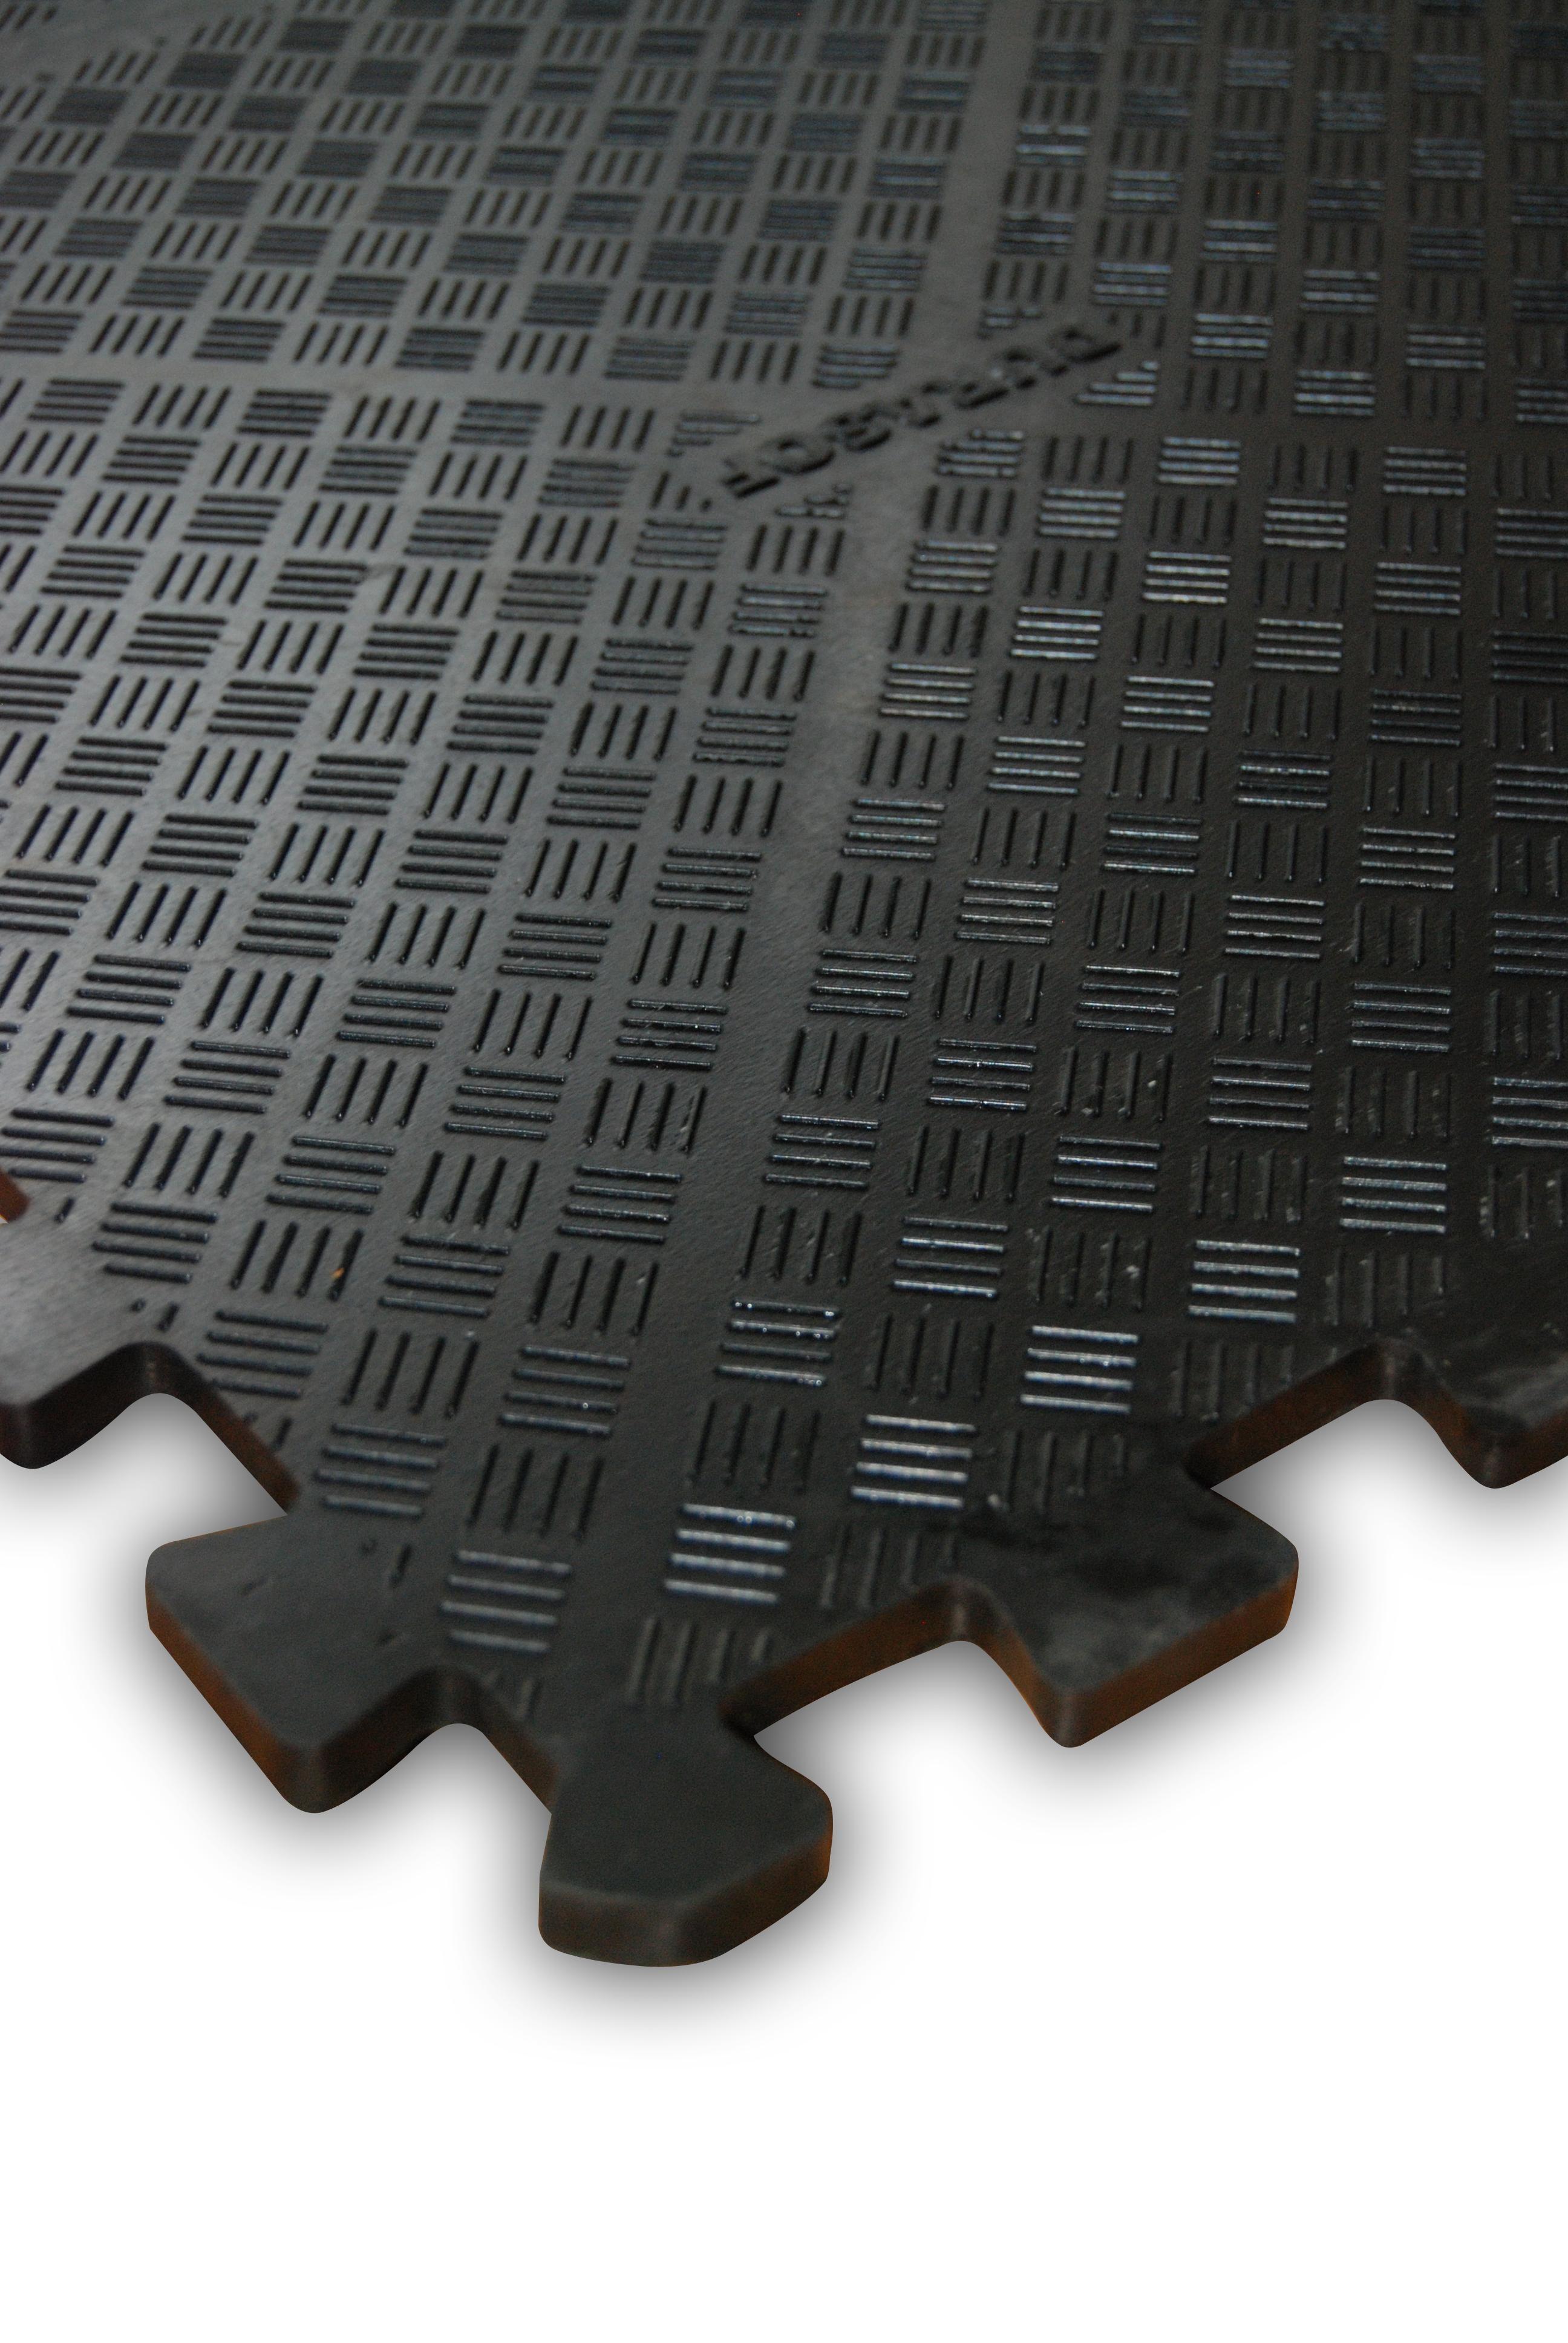 London Gym mats, Rubber flooring, Indoor jungle gym